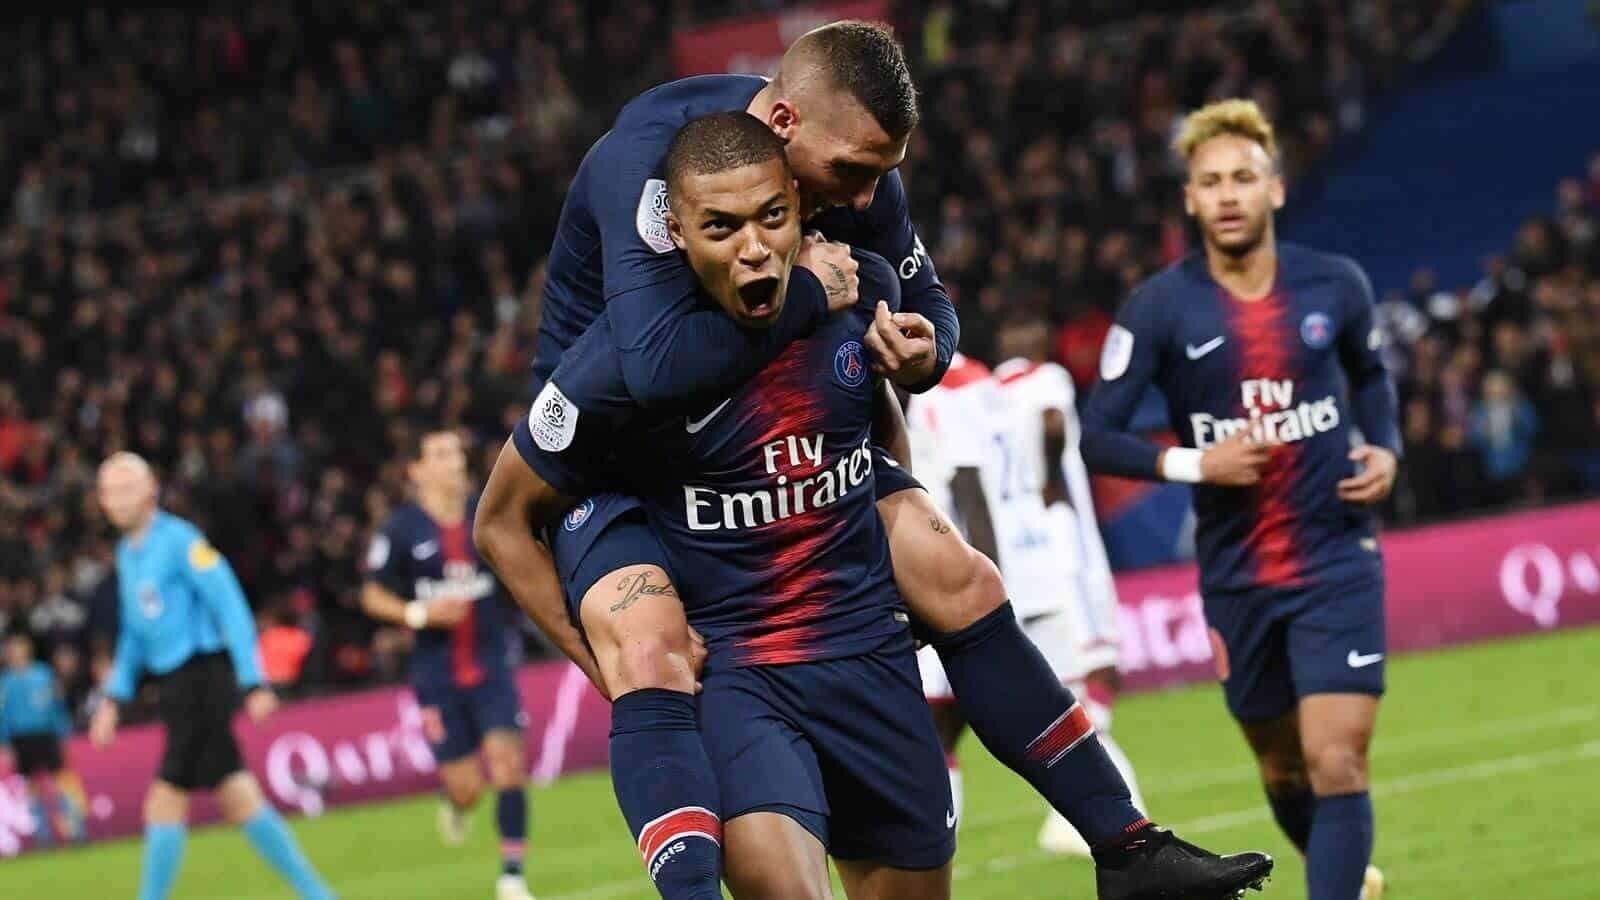 PSG FC SOCCER TEAM 2019